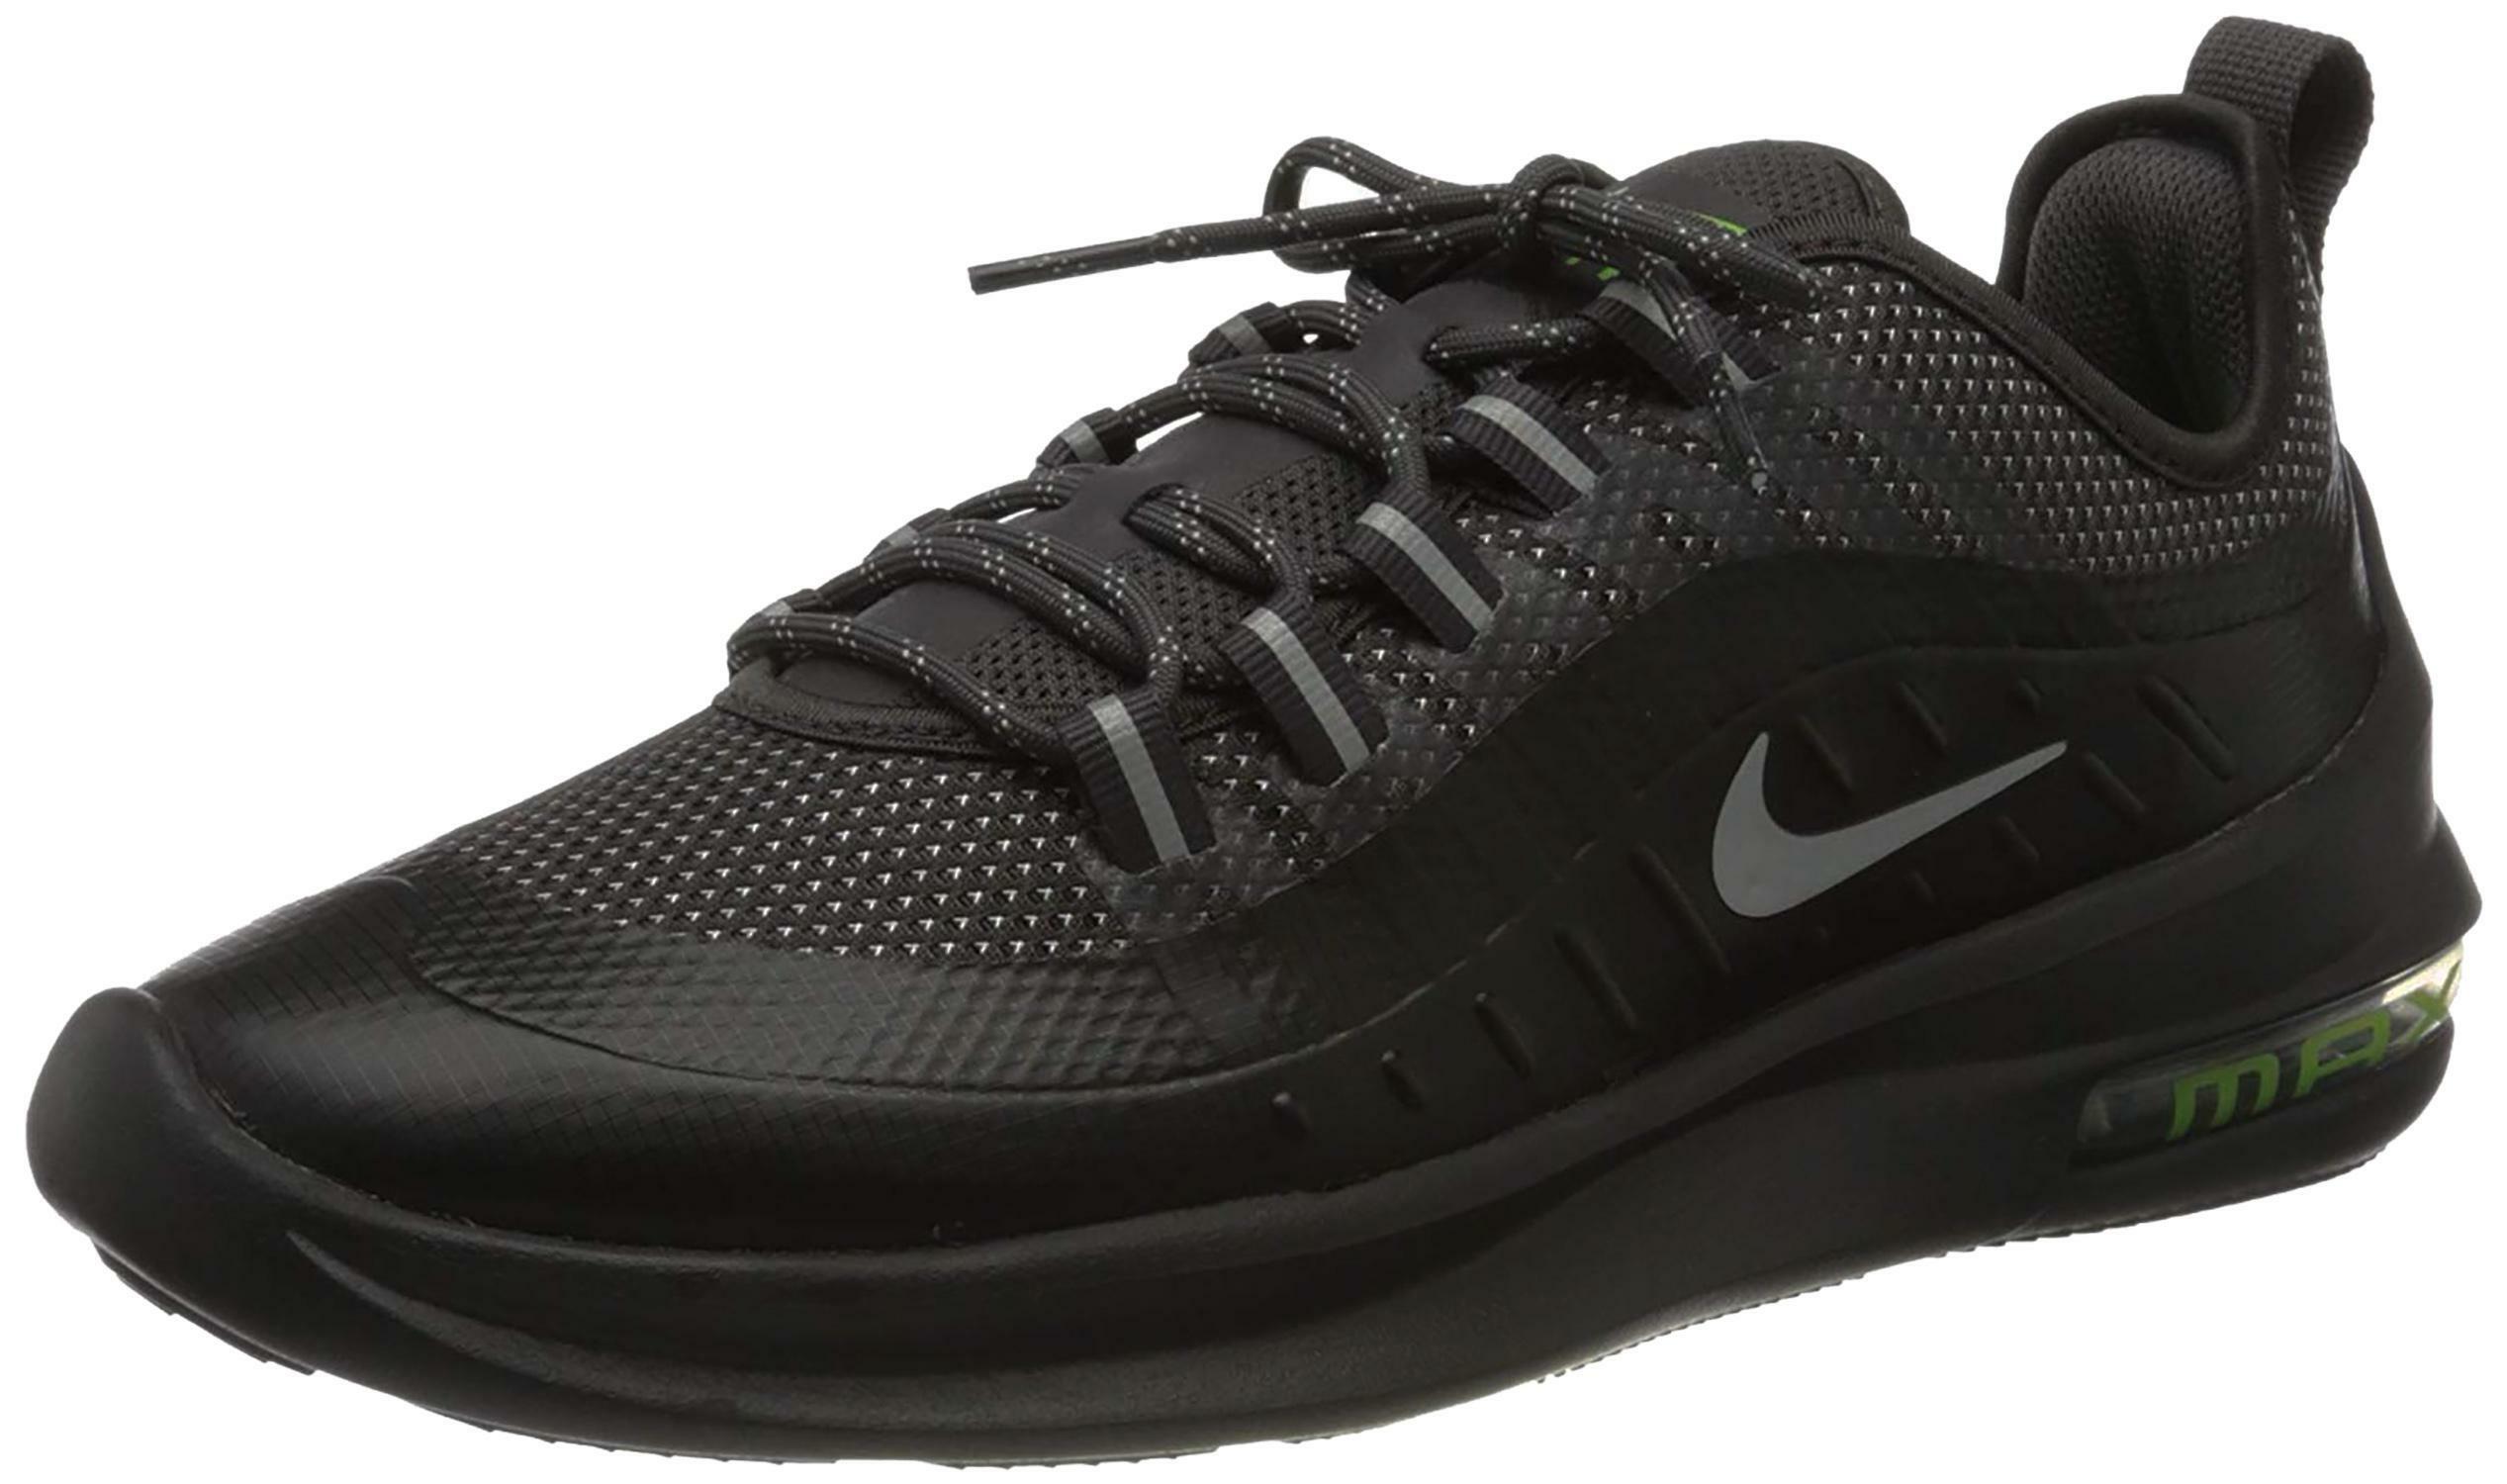 Nike air max axis prem scarpe sportive uomo nere aa2148009